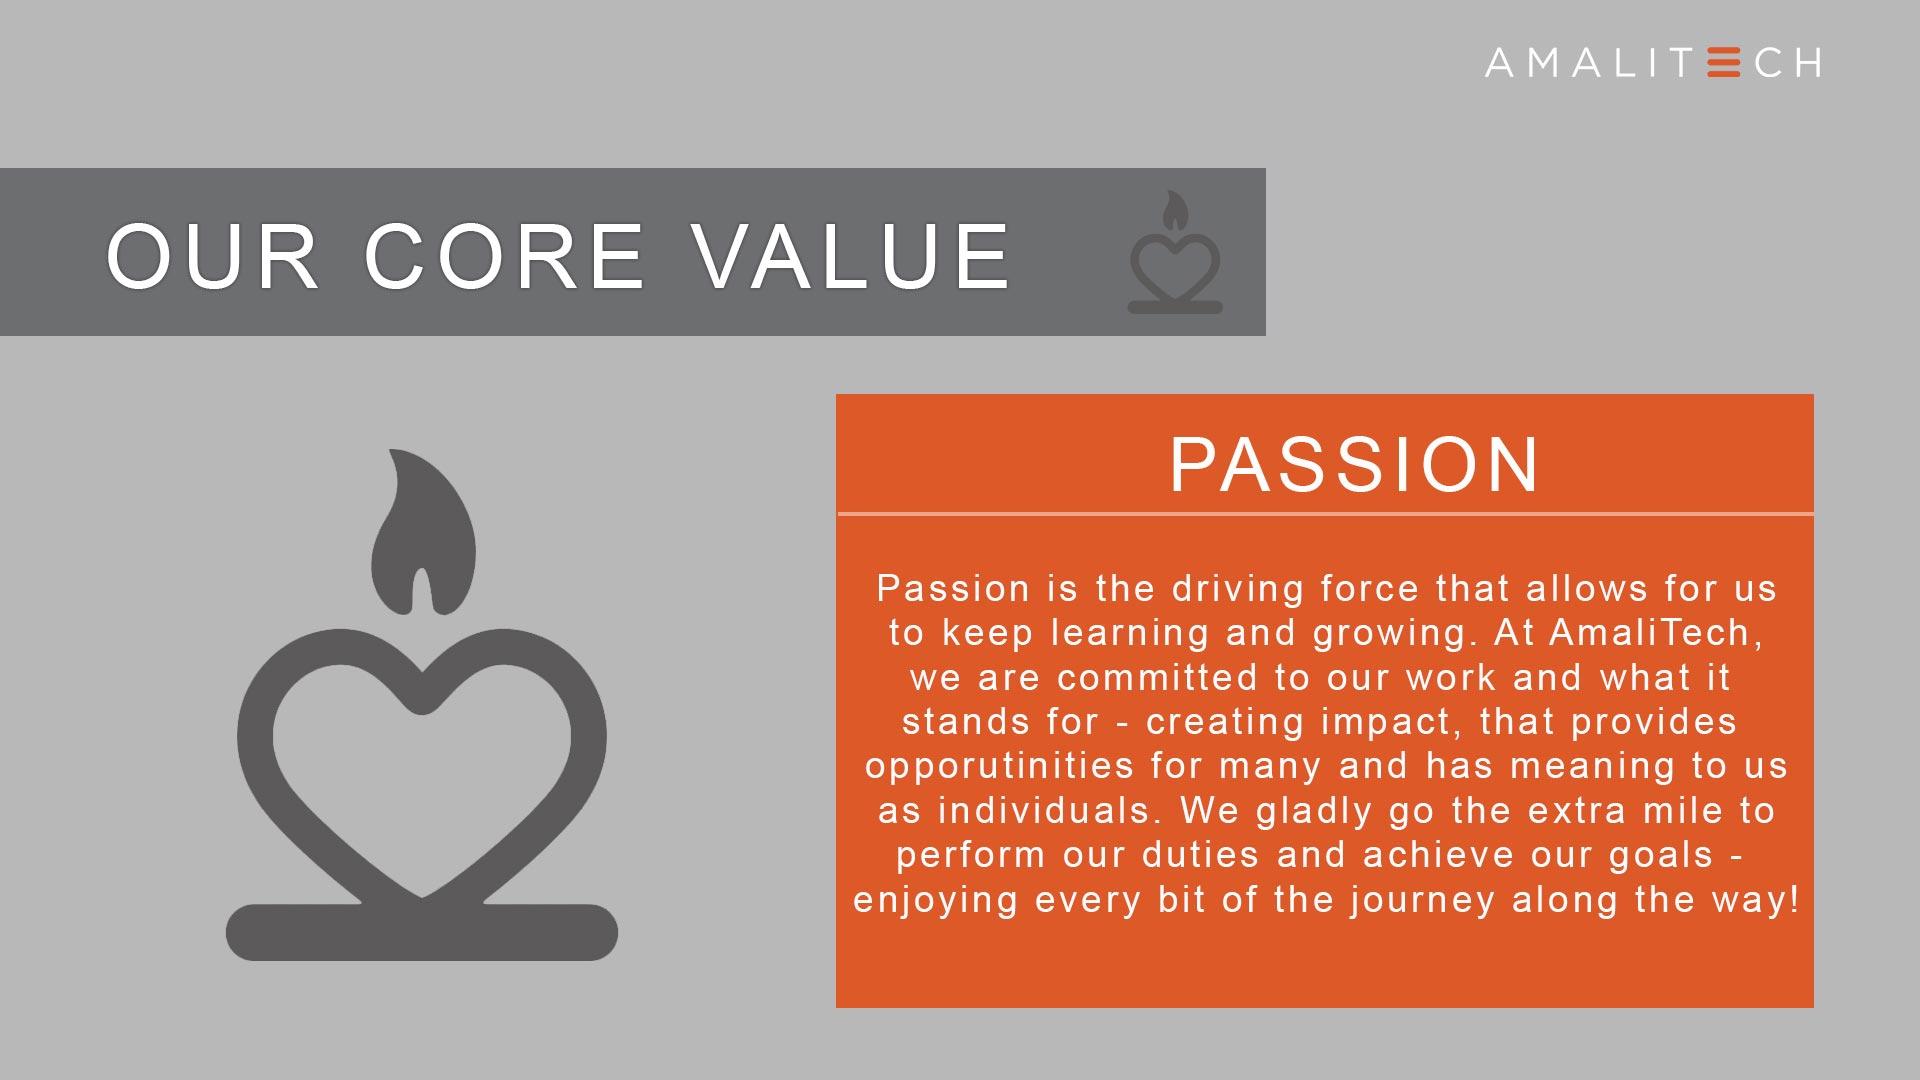 Core Value of Passion